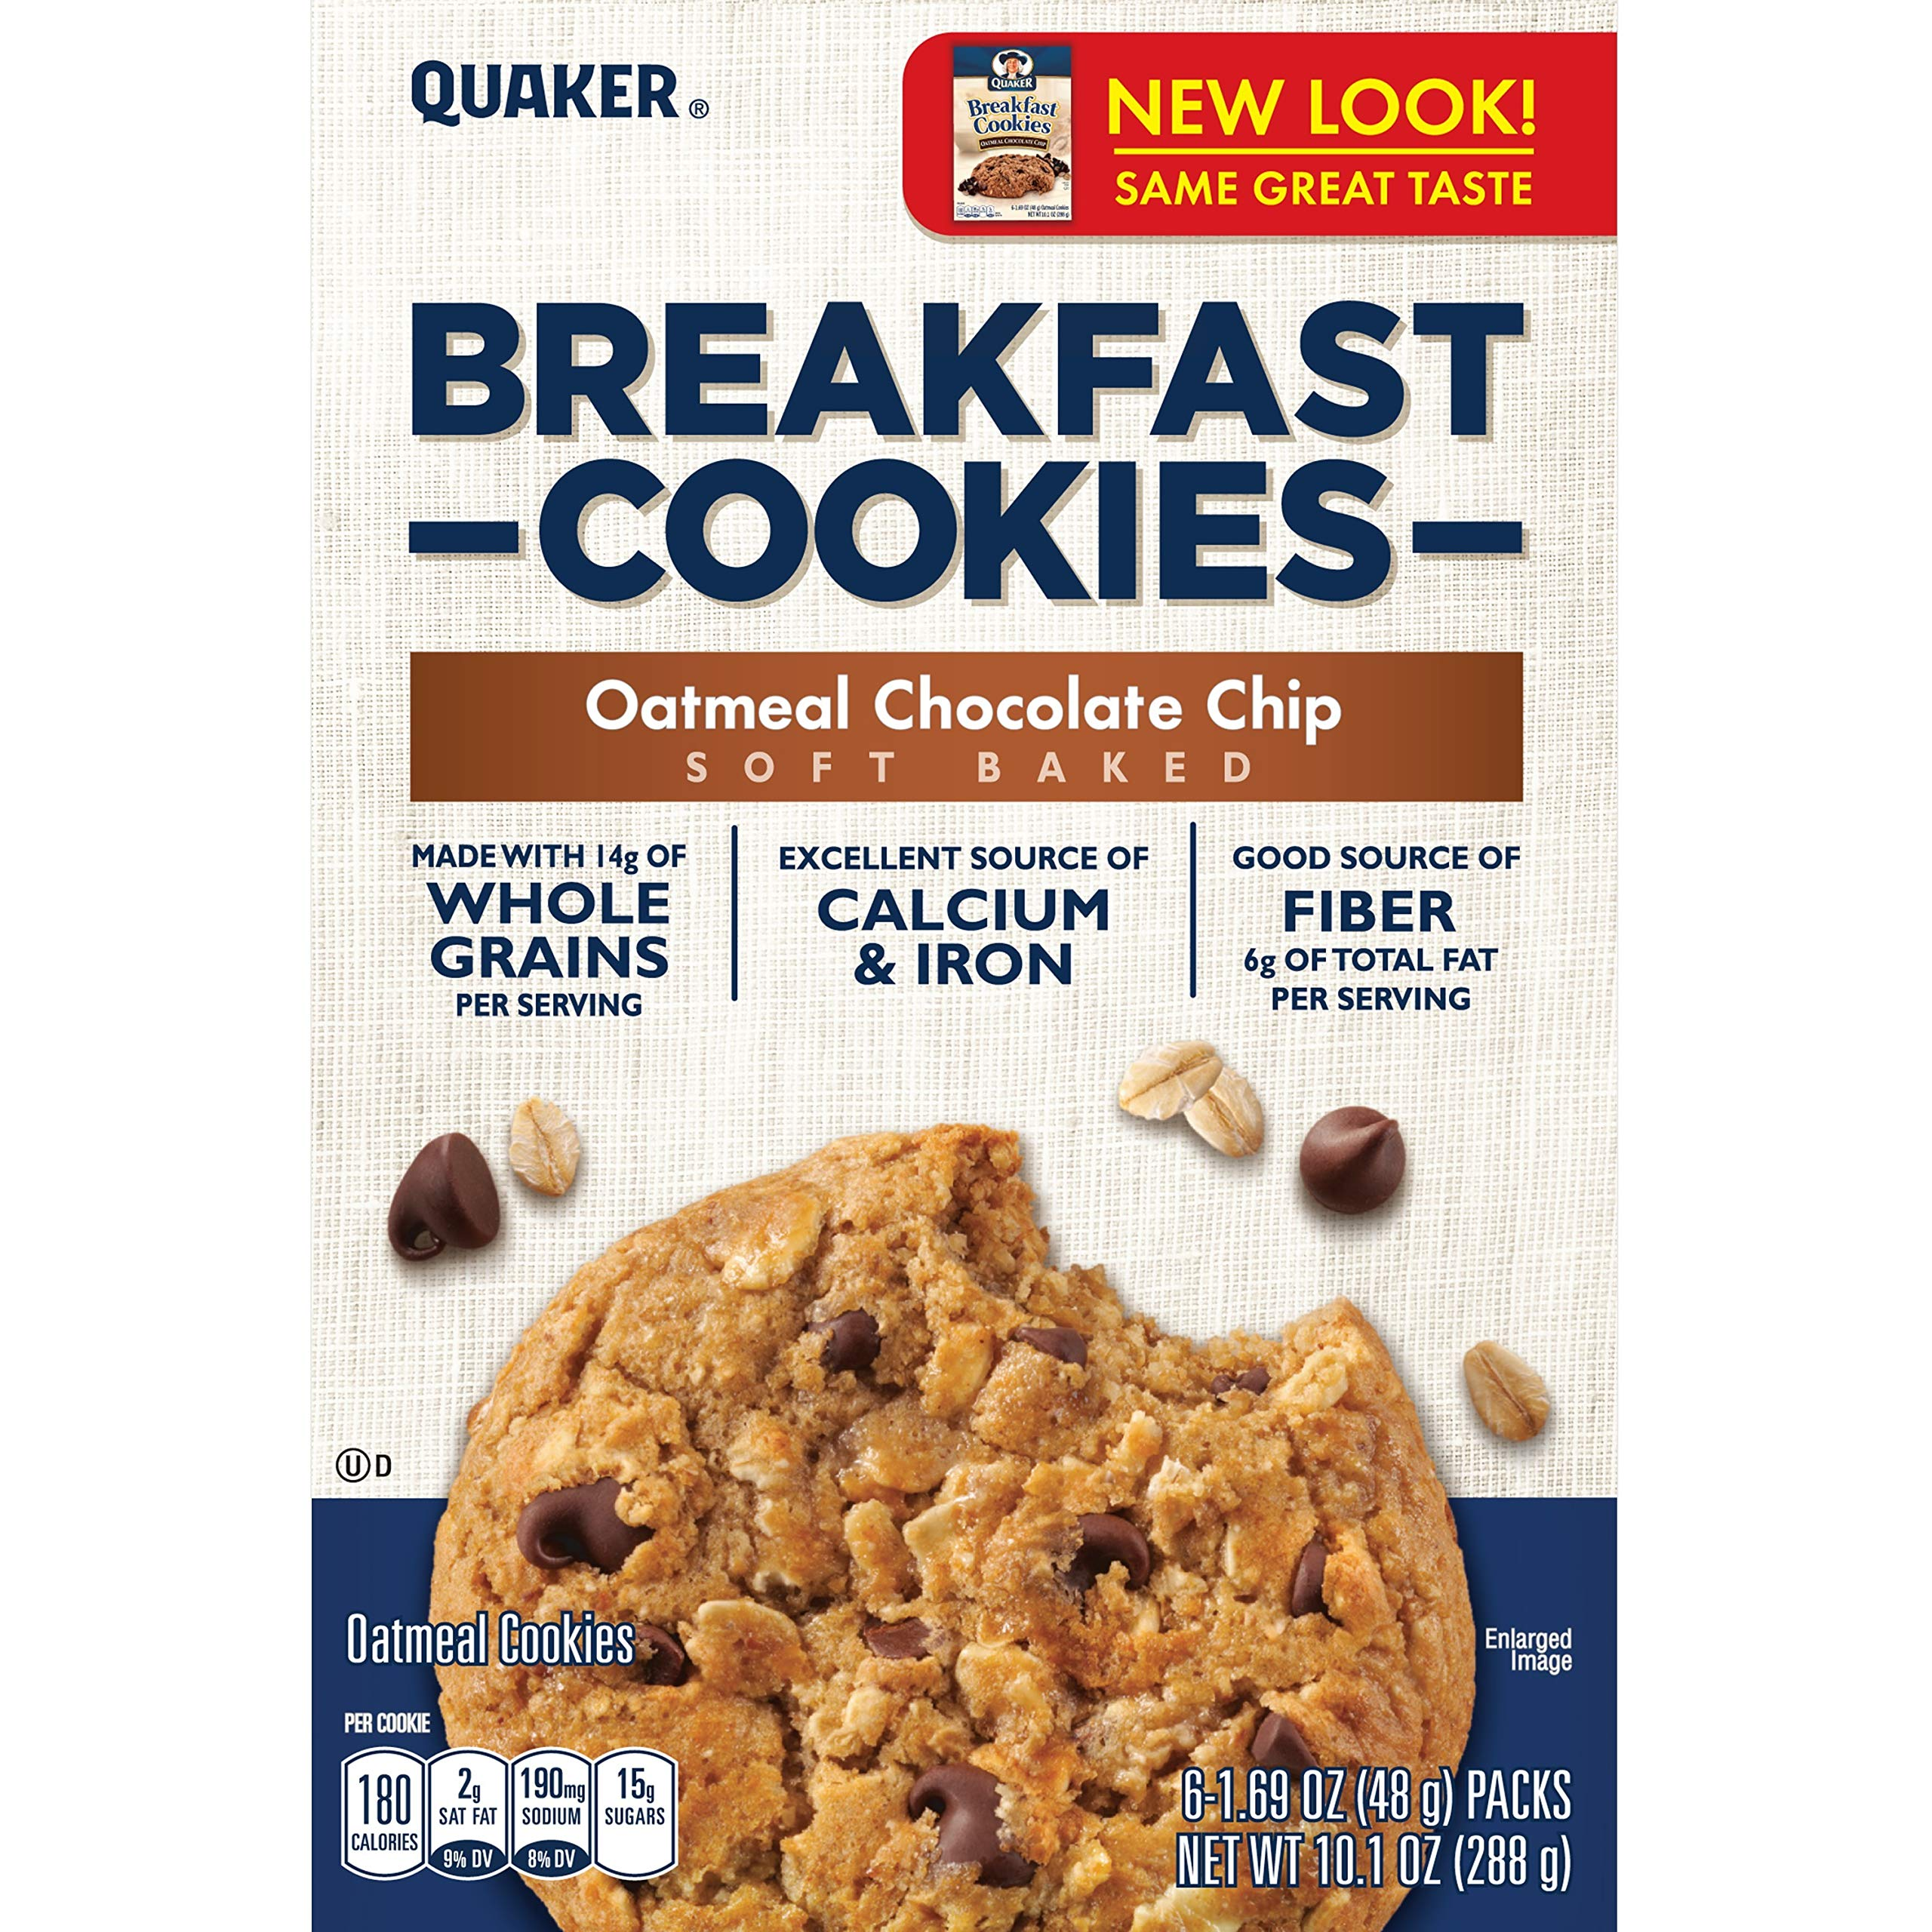 Amazon.com : Quaker Breakfast Cookies, Oatmeal Raisin, 6-1 ... Oatmeal Chocolate Chip Cookies Packaging